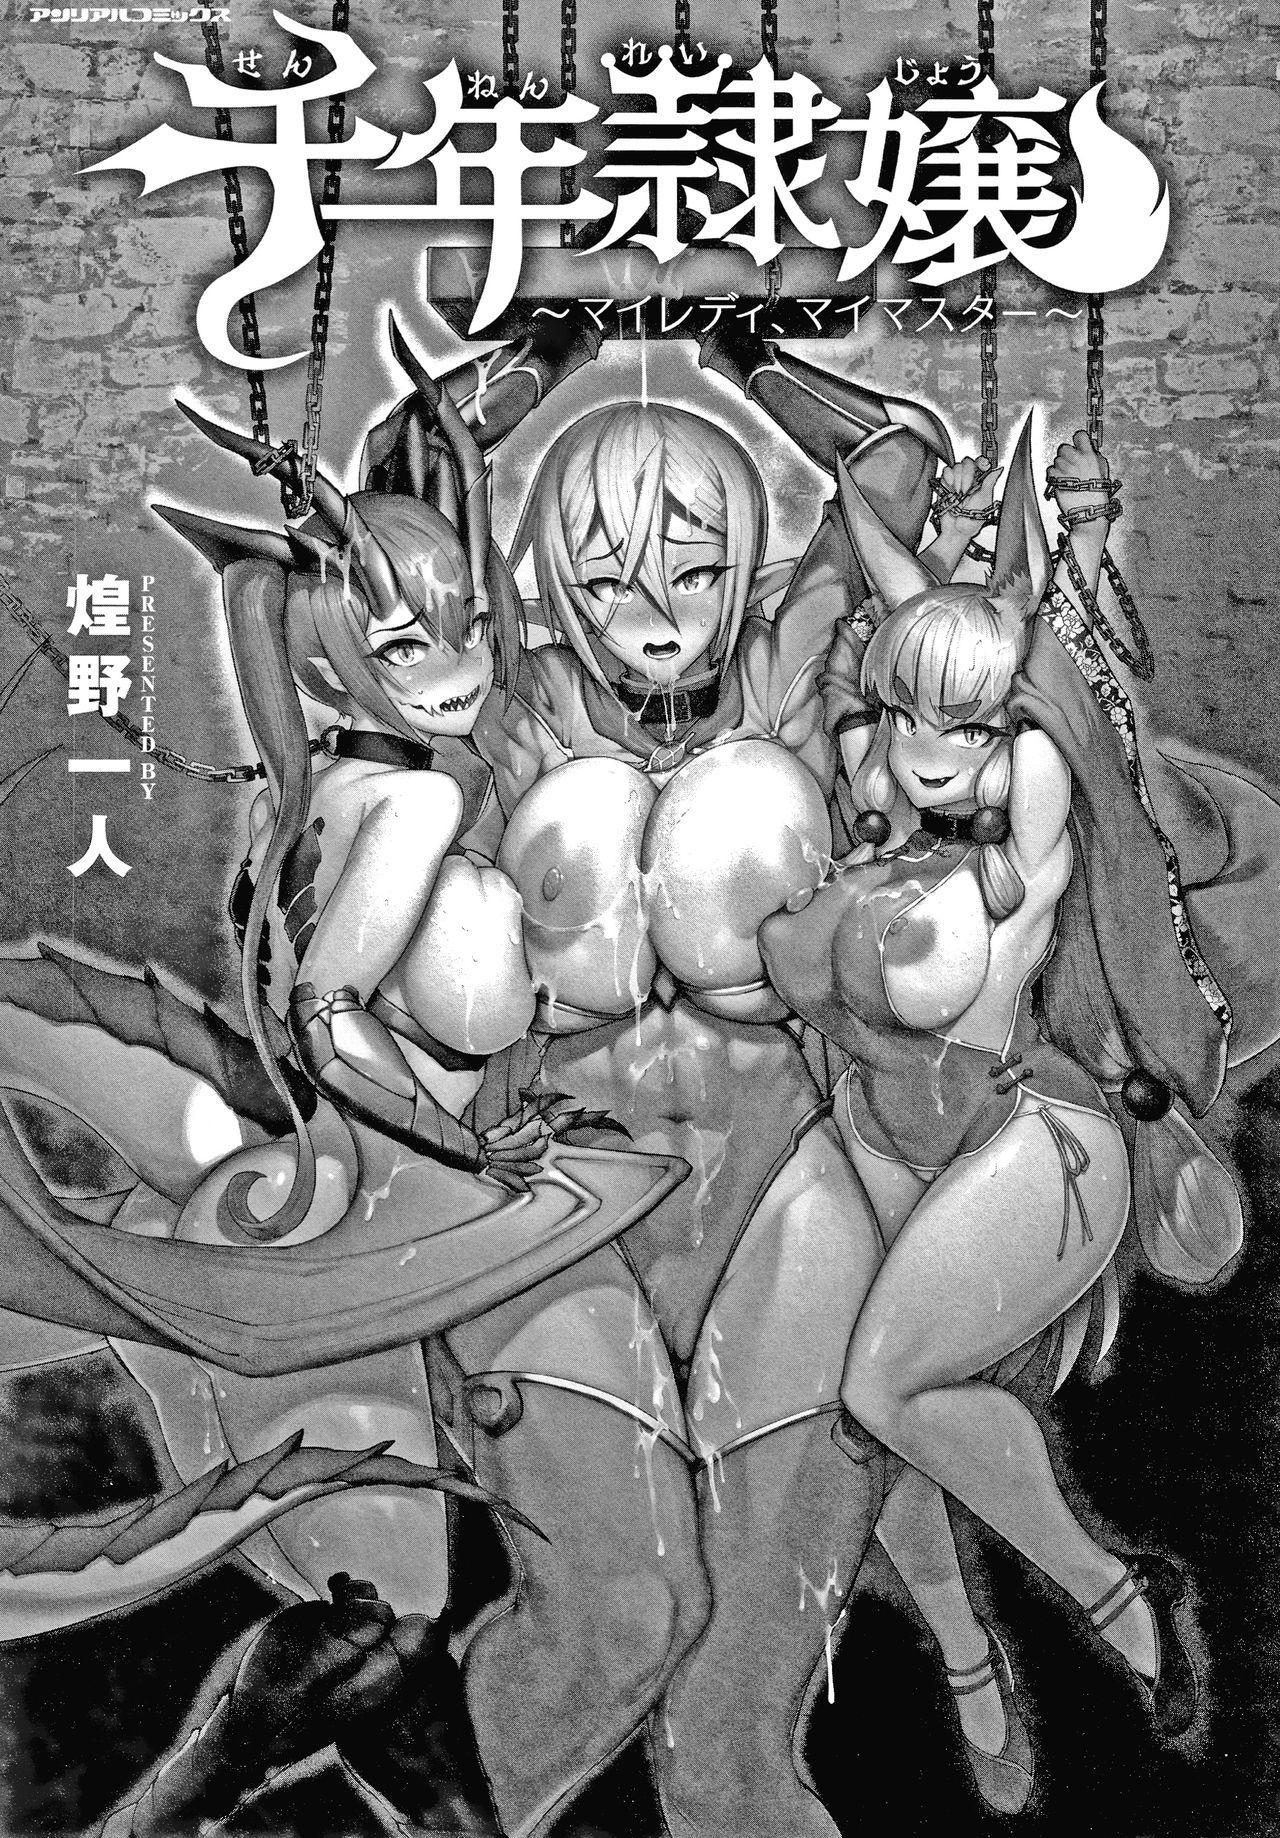 [Fan no Hitori] Sennen Reijou ~ My Lady, My Master ~  Ch.1-2 [English] {Doujins.com} 3